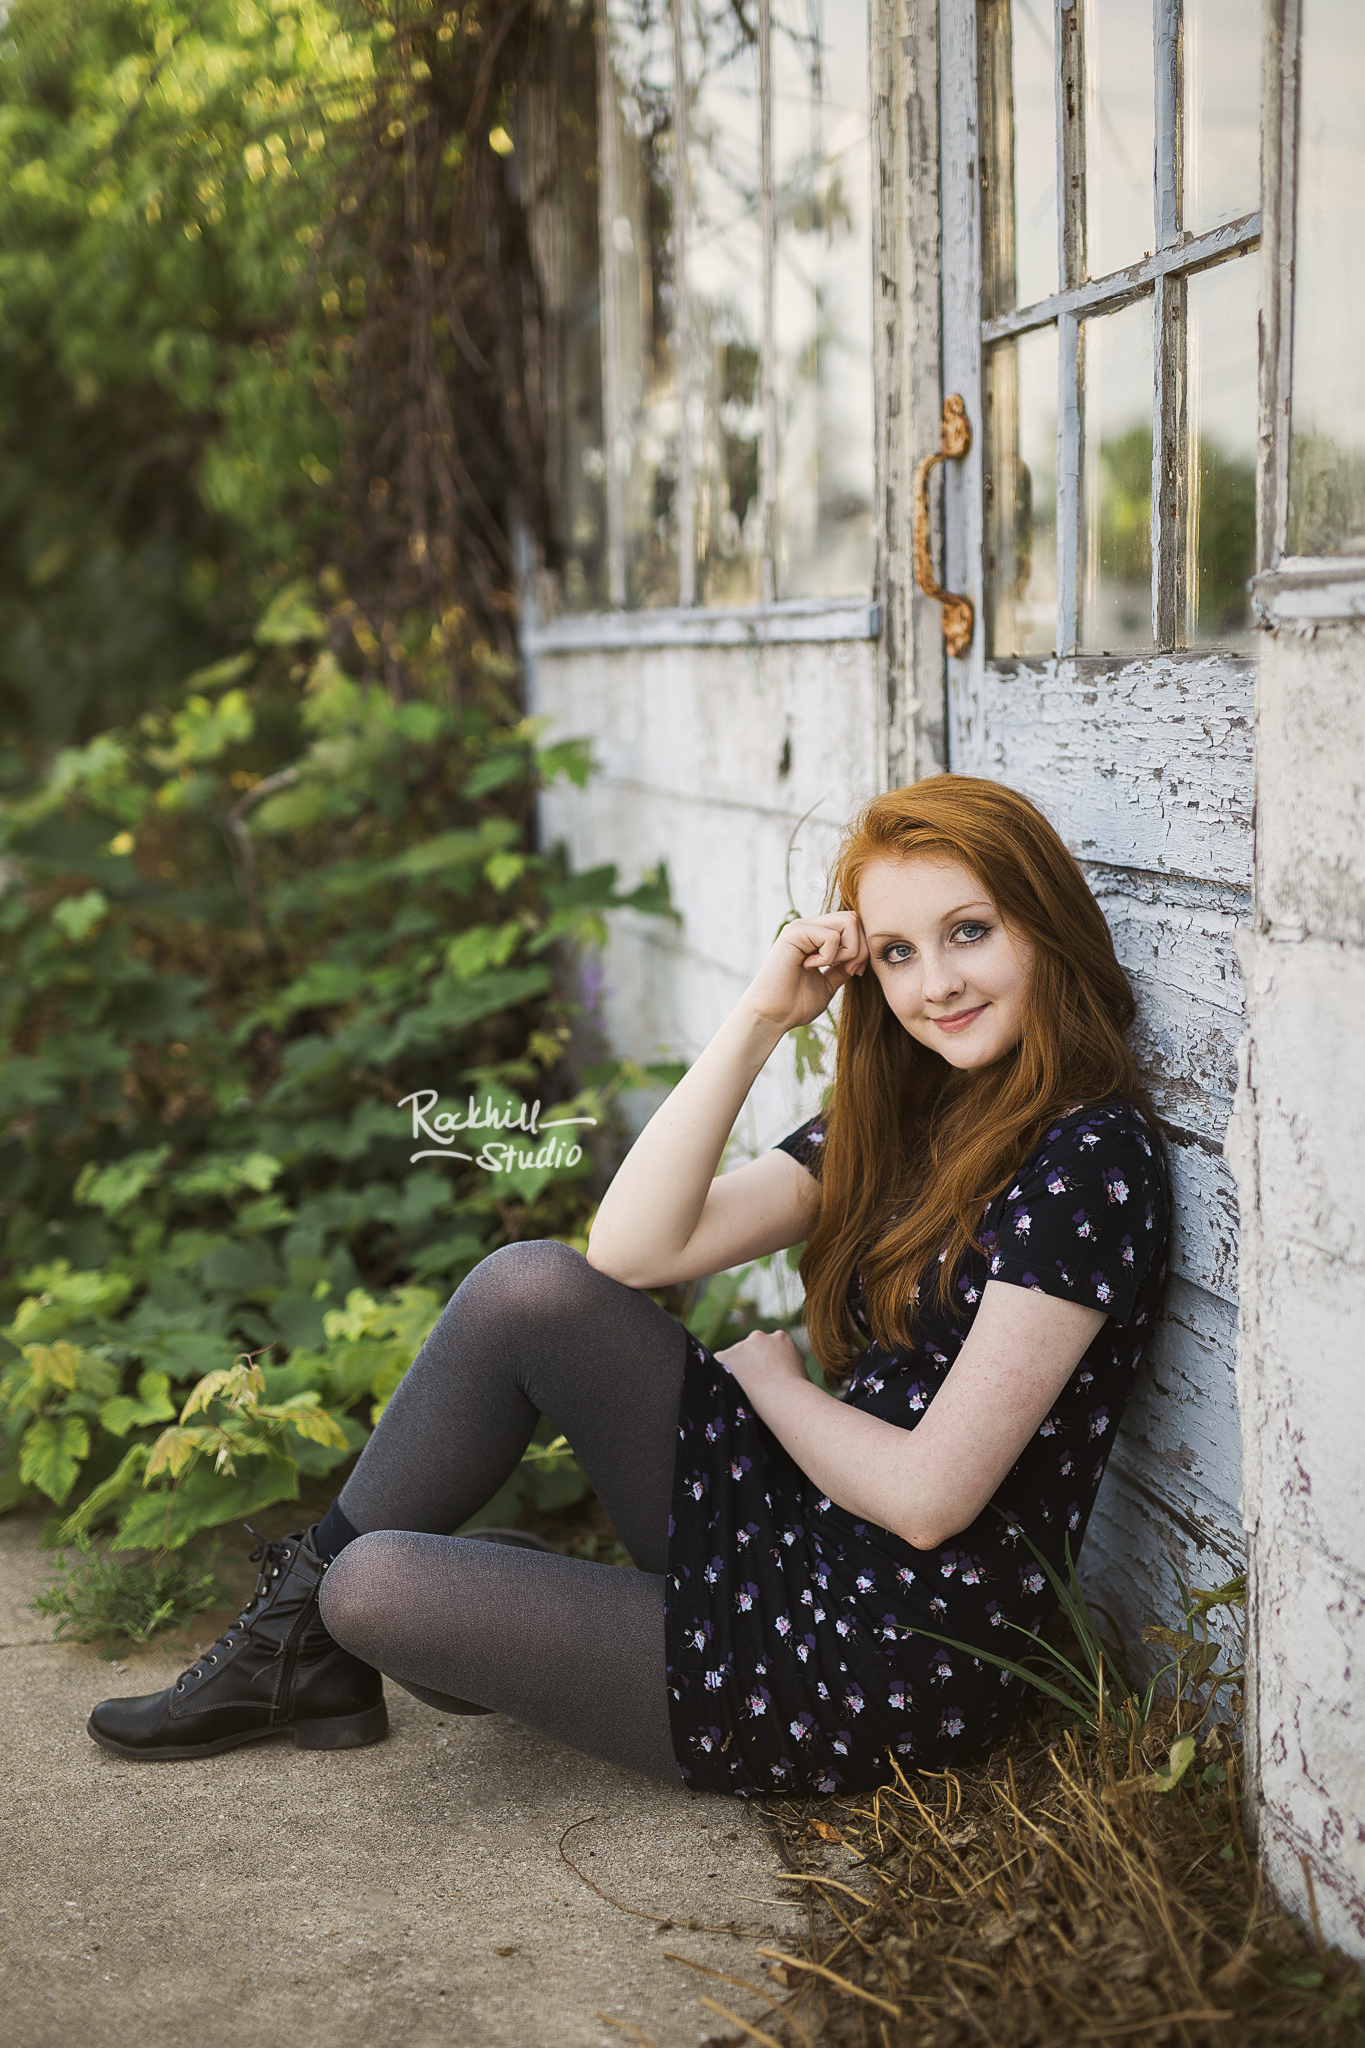 marquette-senior-photographer-upper-peninsula-michigan-girl-garden-wall.jpg